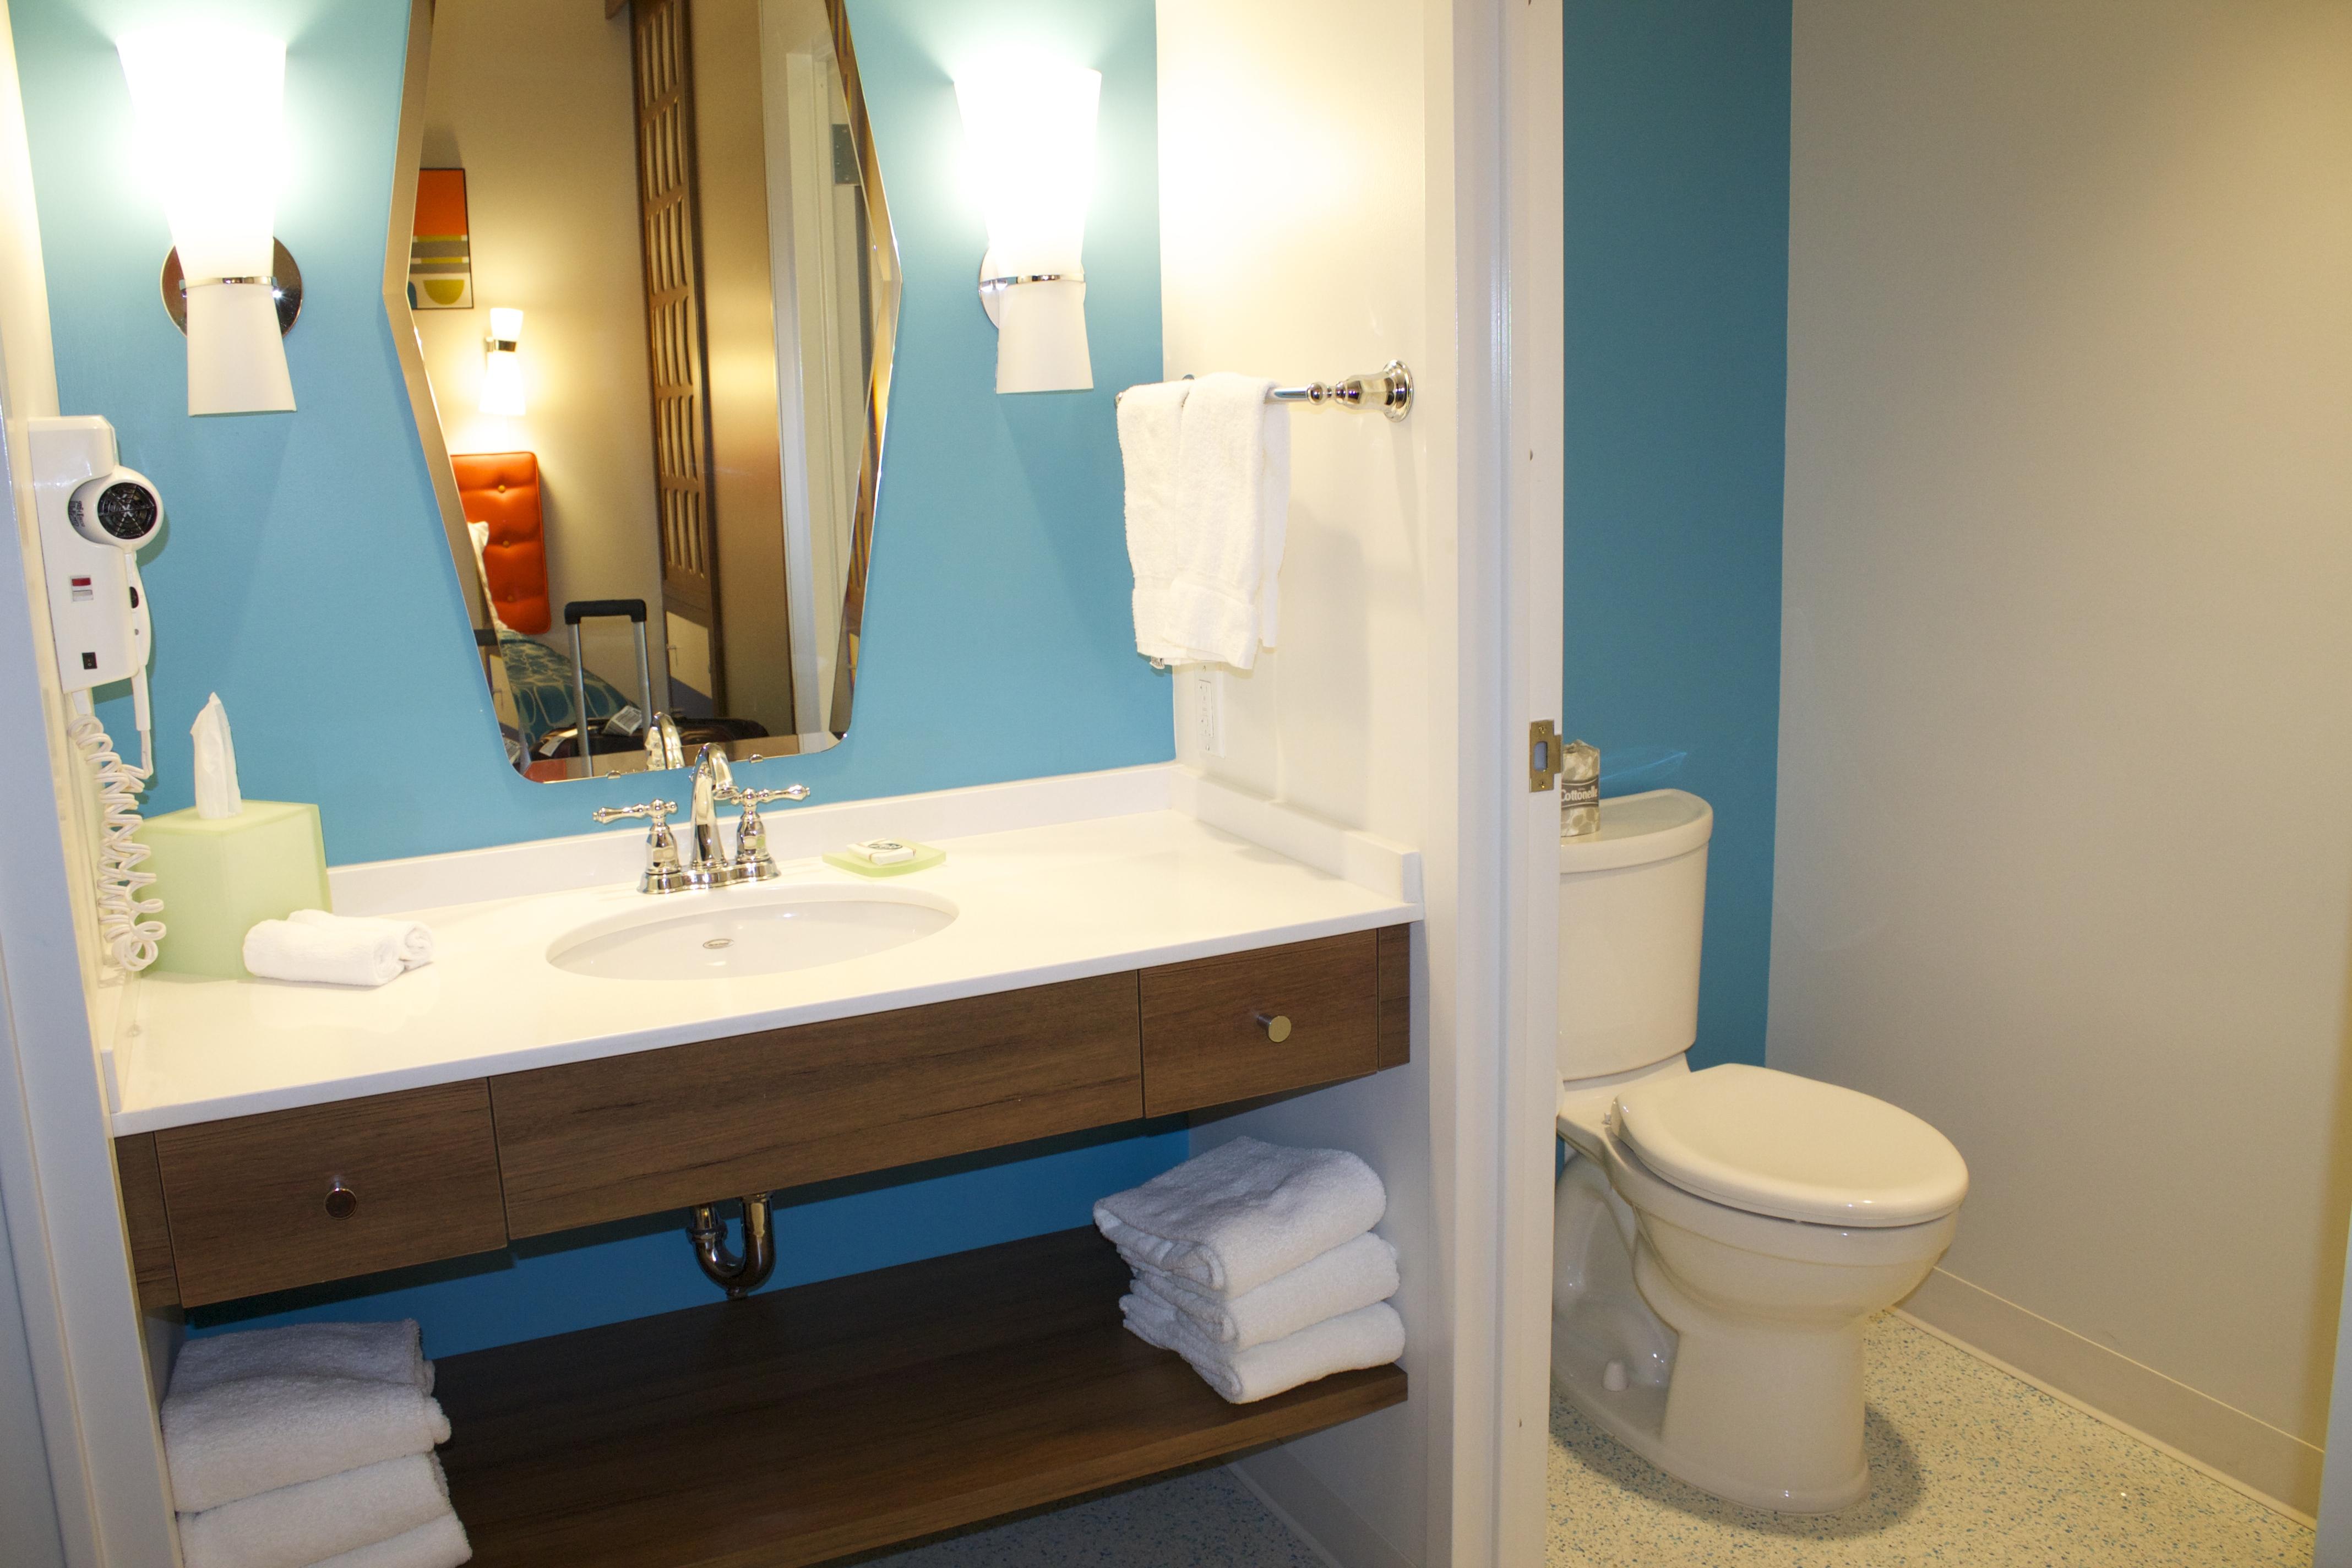 cabana bay beach resort family suites